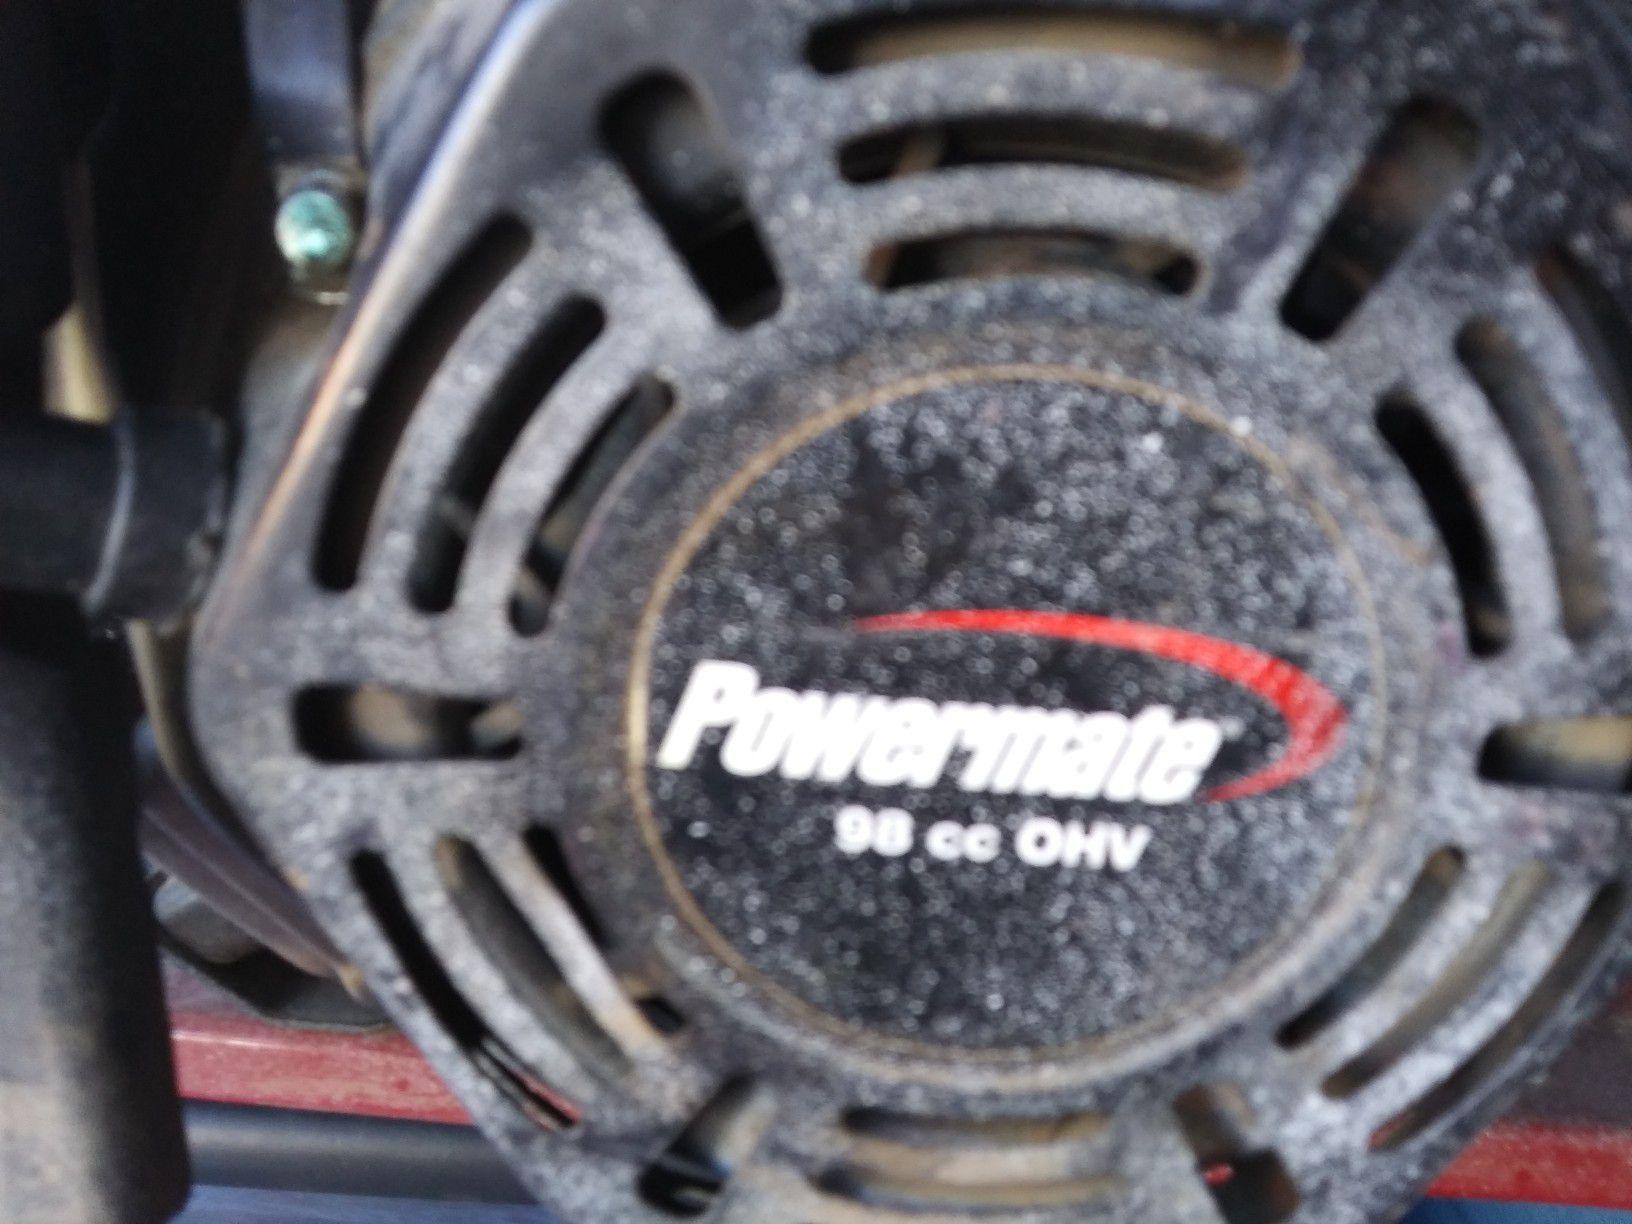 Photo Coleman PowerMate 1200w portable generator